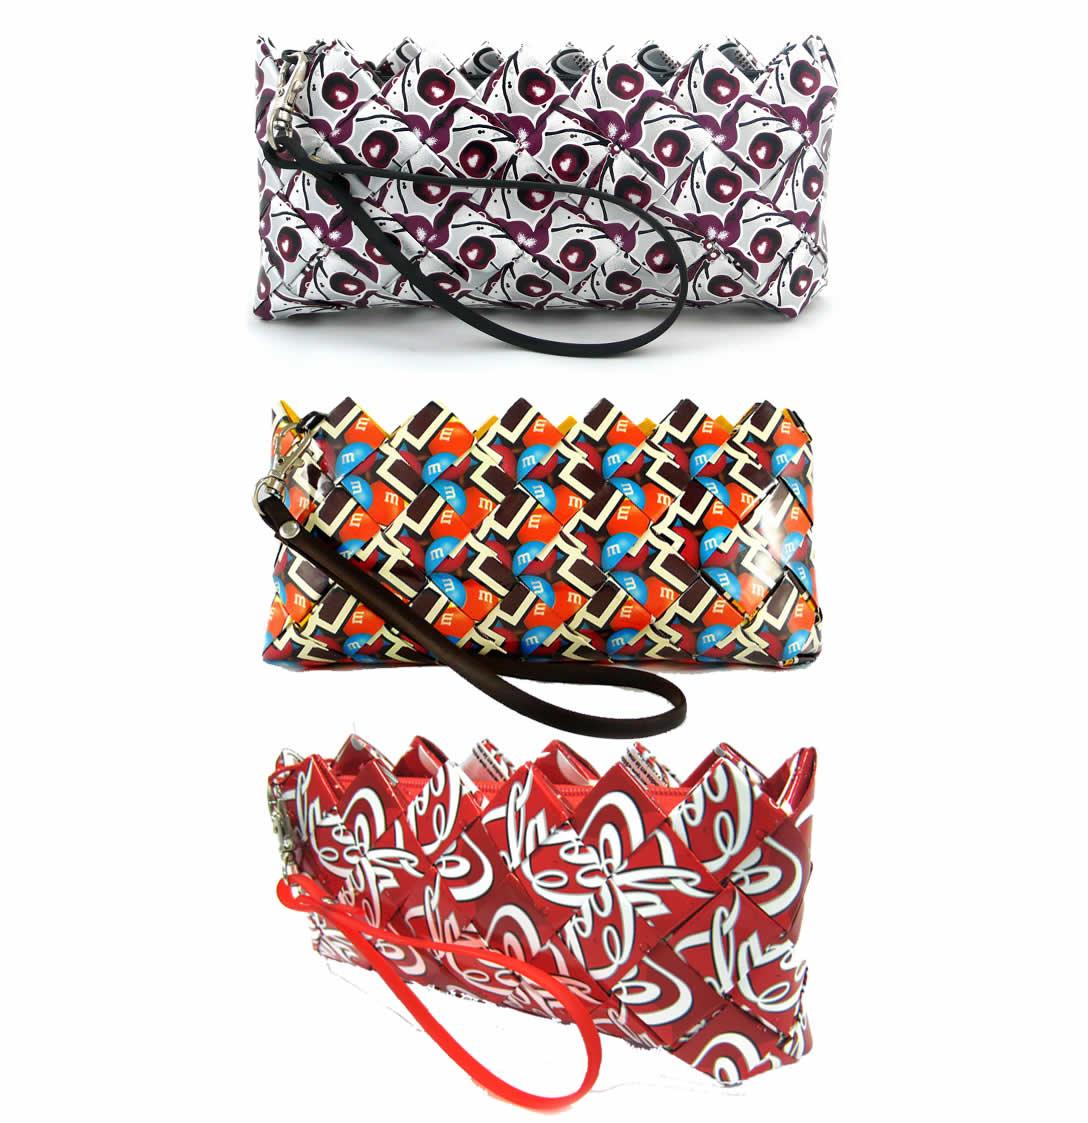 eco-designer-bags-1310133829-jpg